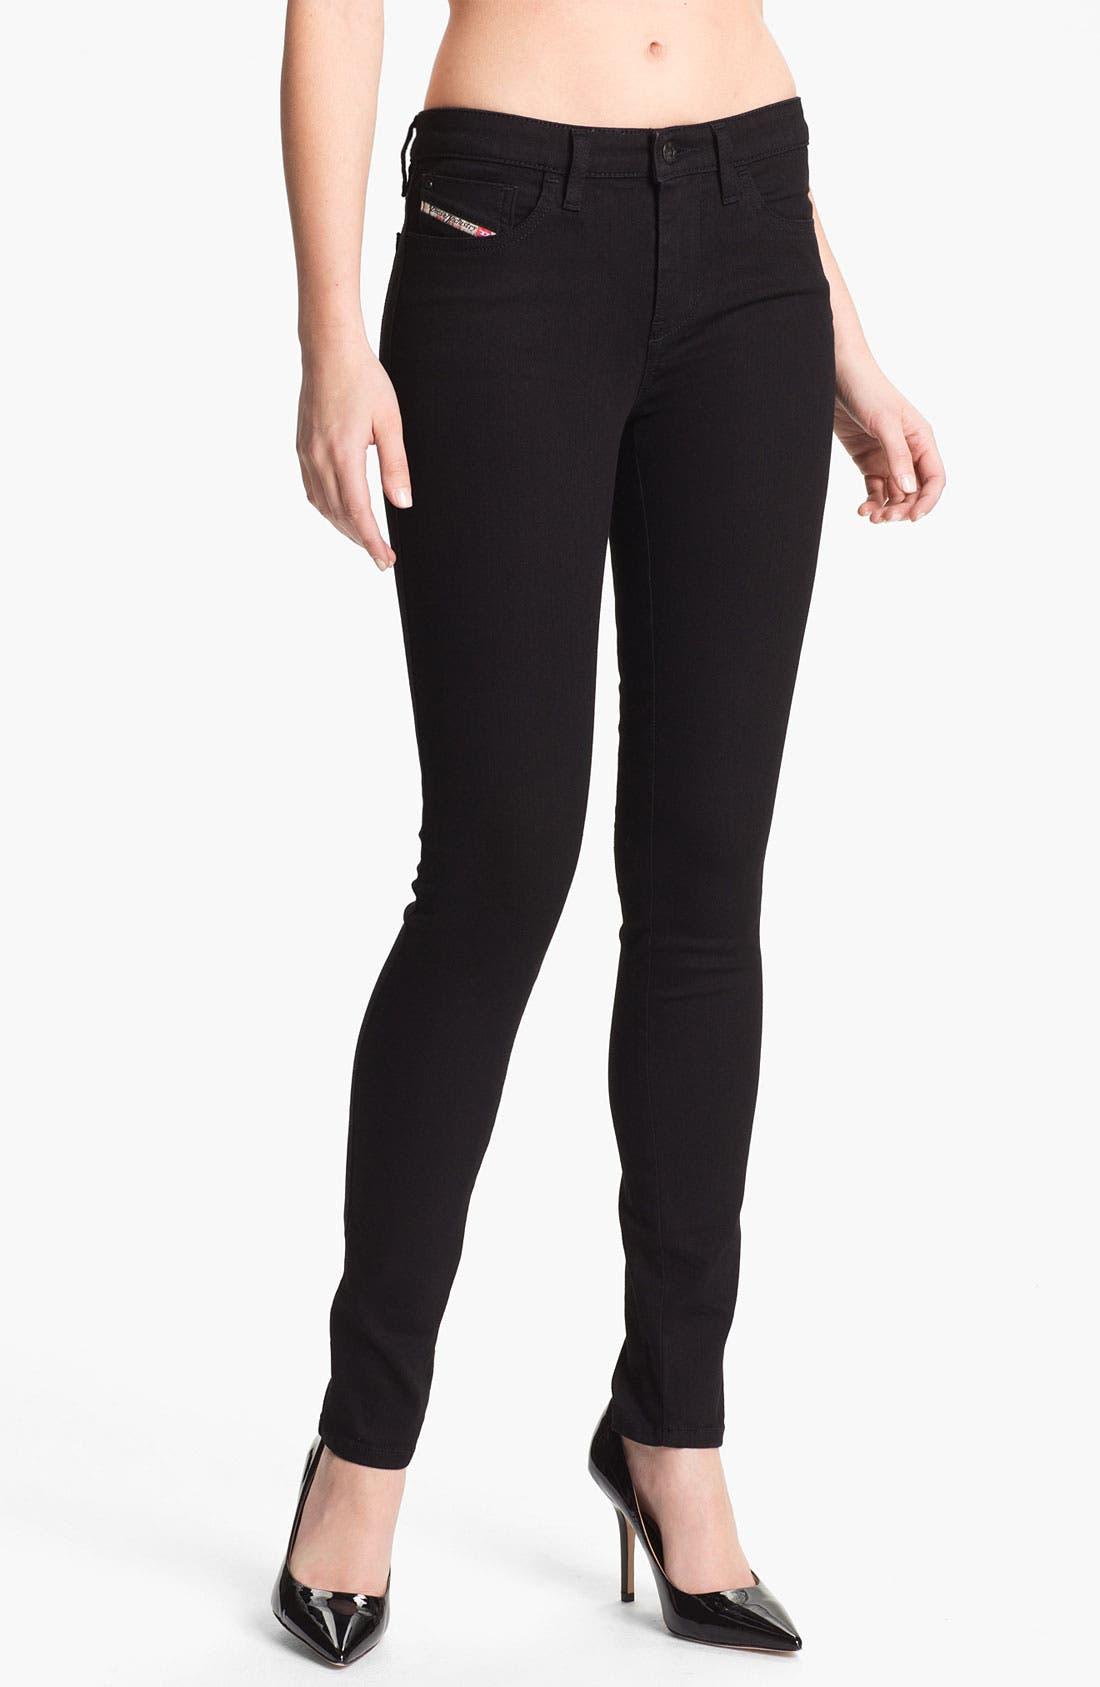 Main Image - DIESEL® 'Skinzee' Stretch Skinny Jeans (Black)